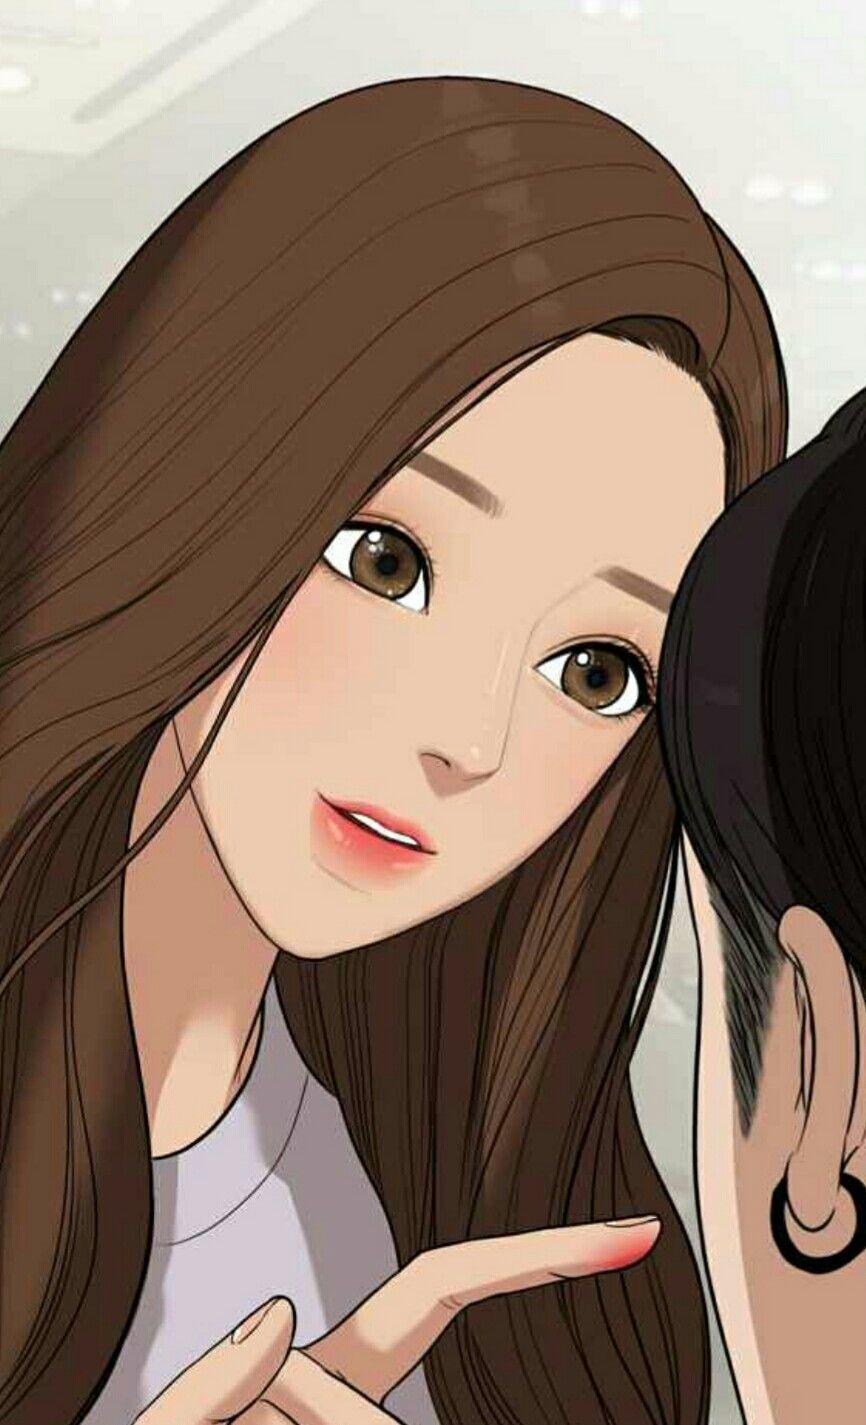 Jukyung Lim from WEBTOON True Beauty/The Secret of Angel by